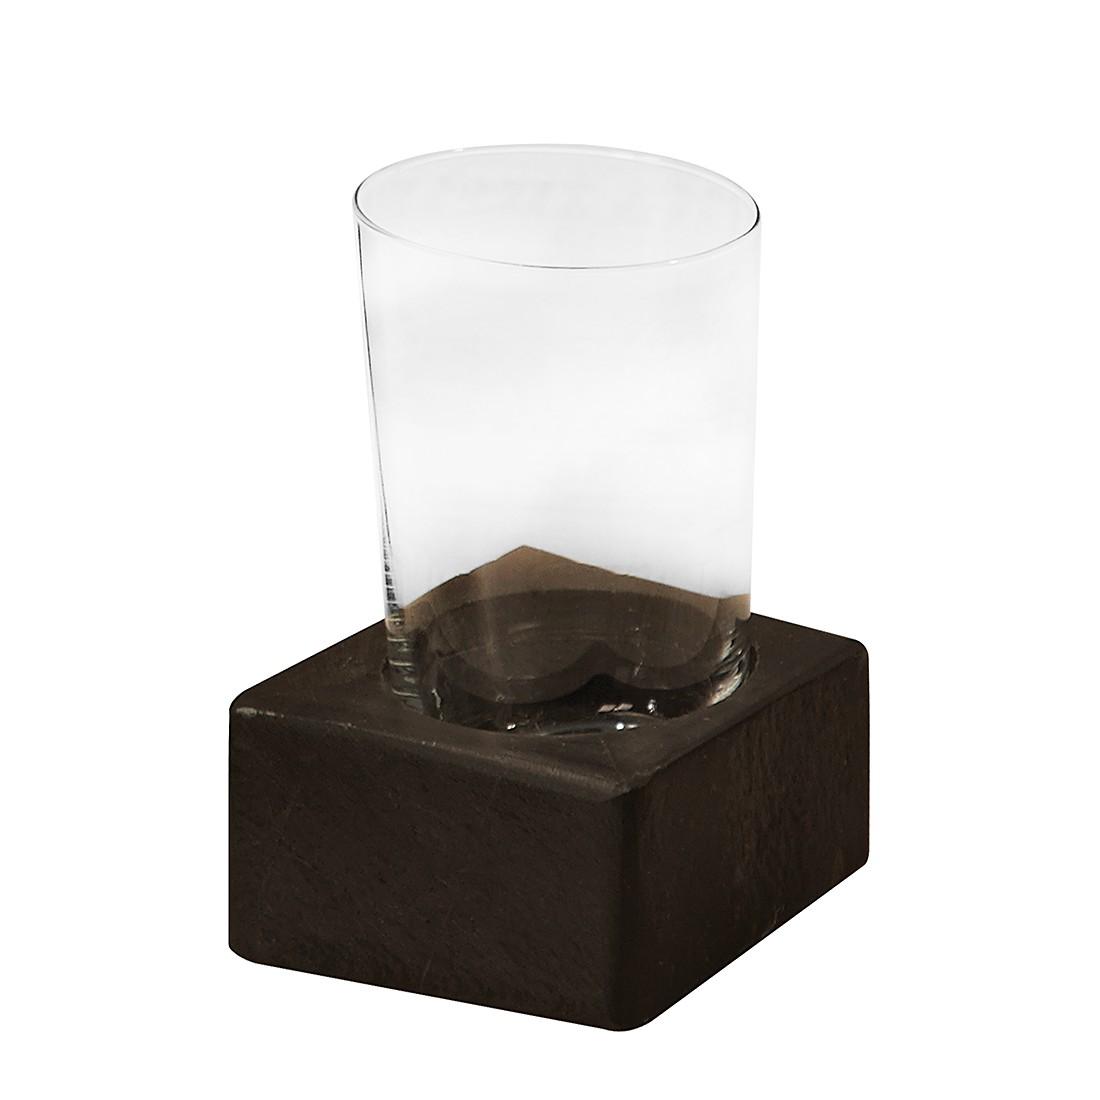 Glas Petra - met sokkel antracietkleurig, Nicol Wohnausstattungen